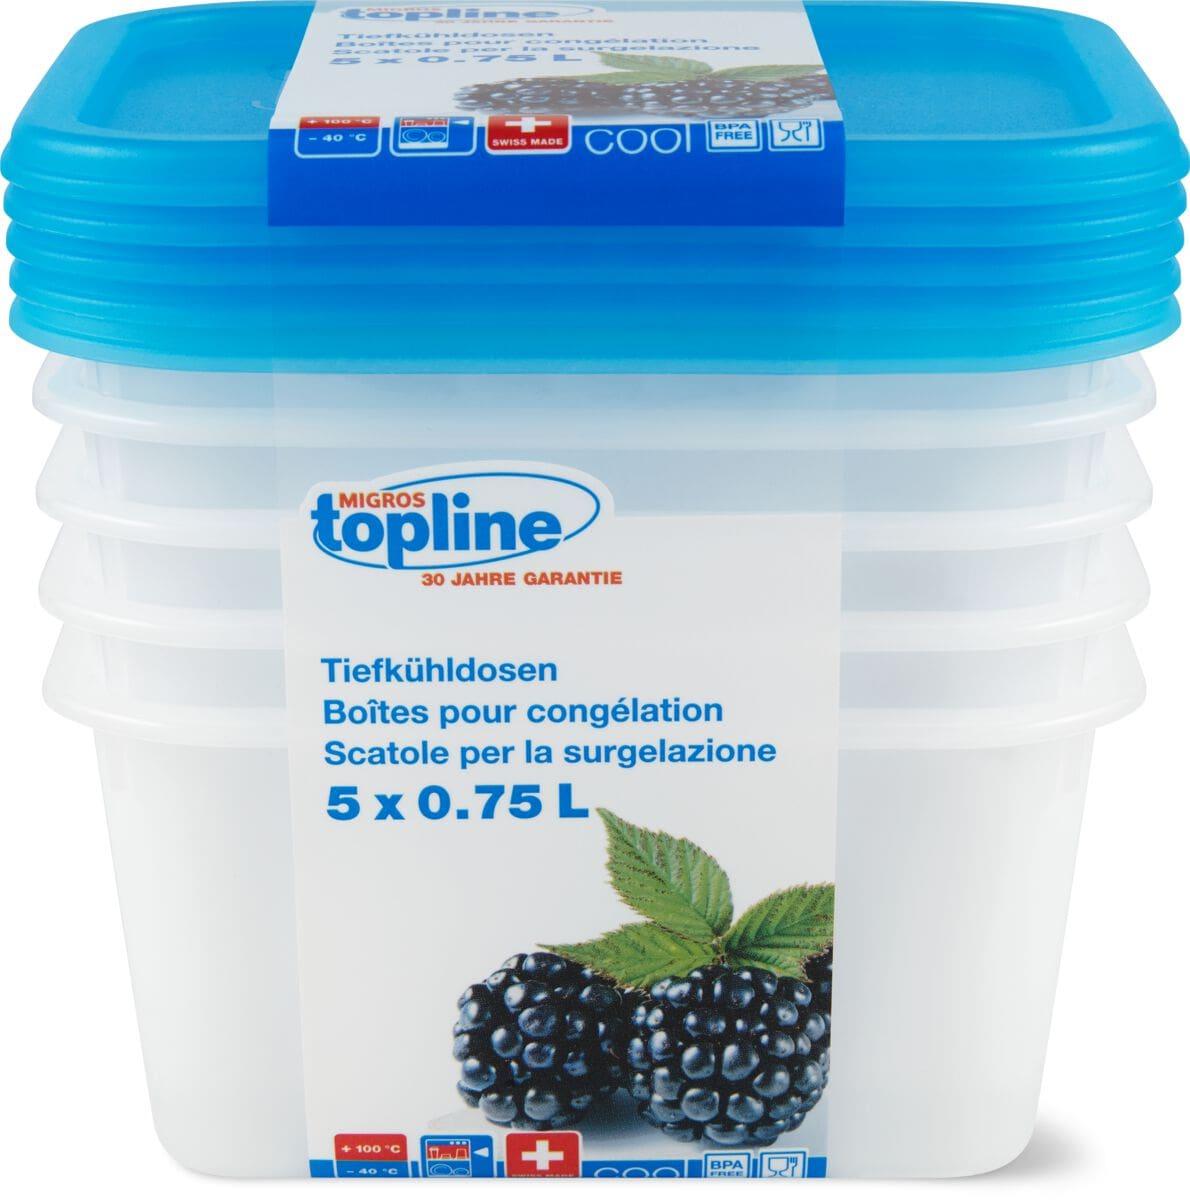 M-Topline COOL Tiefkühldose 0.75L